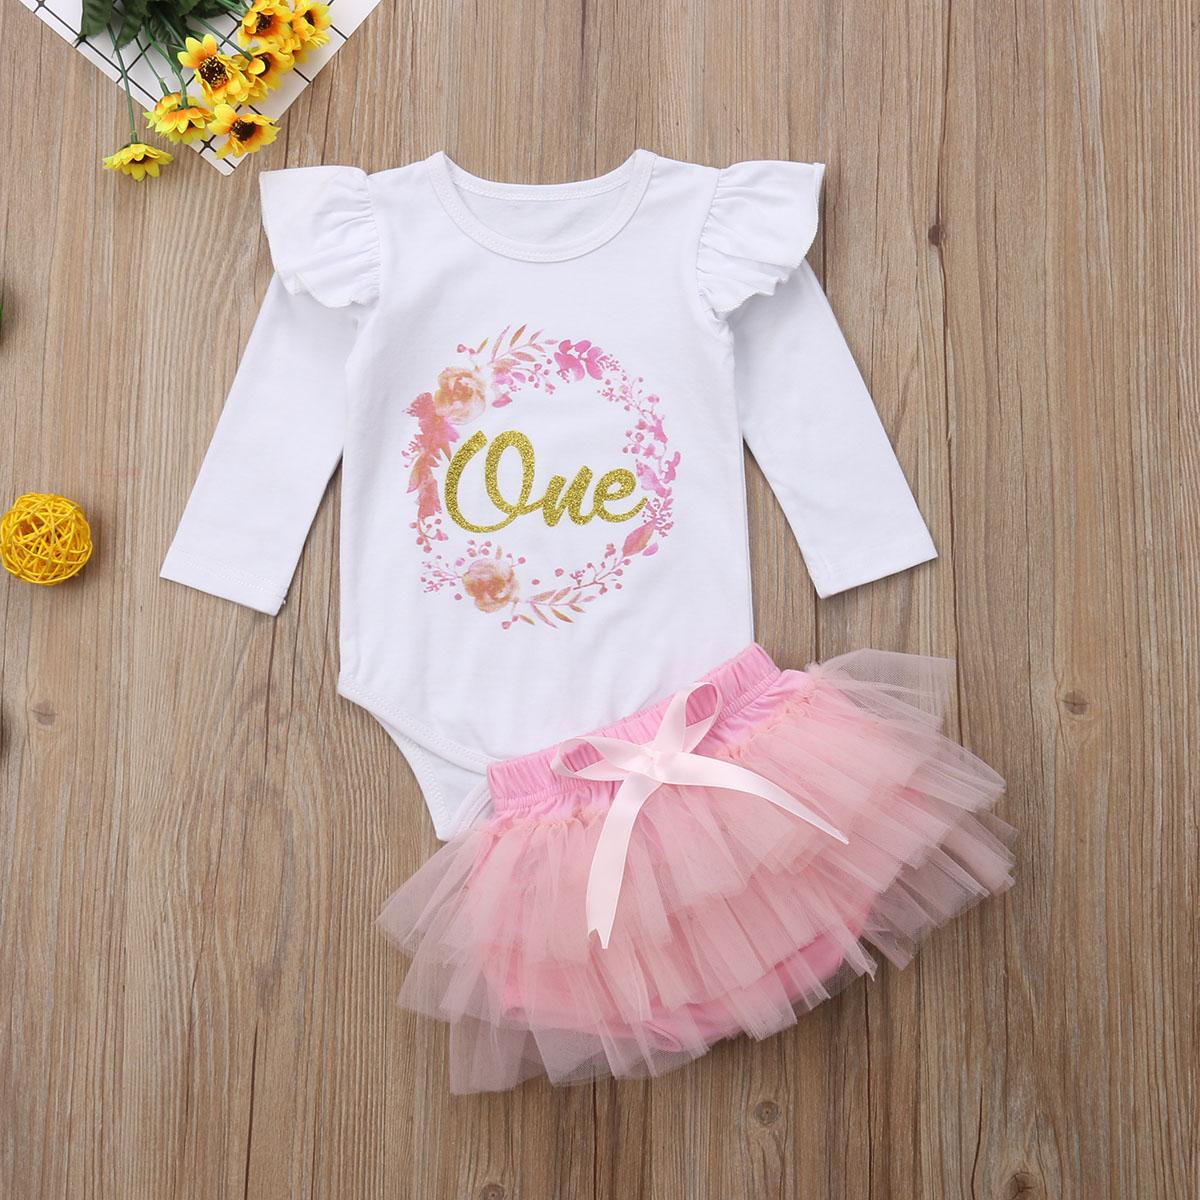 4PCS Baby Girl 1st Birthday Outfits Tutu Romper Skirt Princess Dress Photo Props